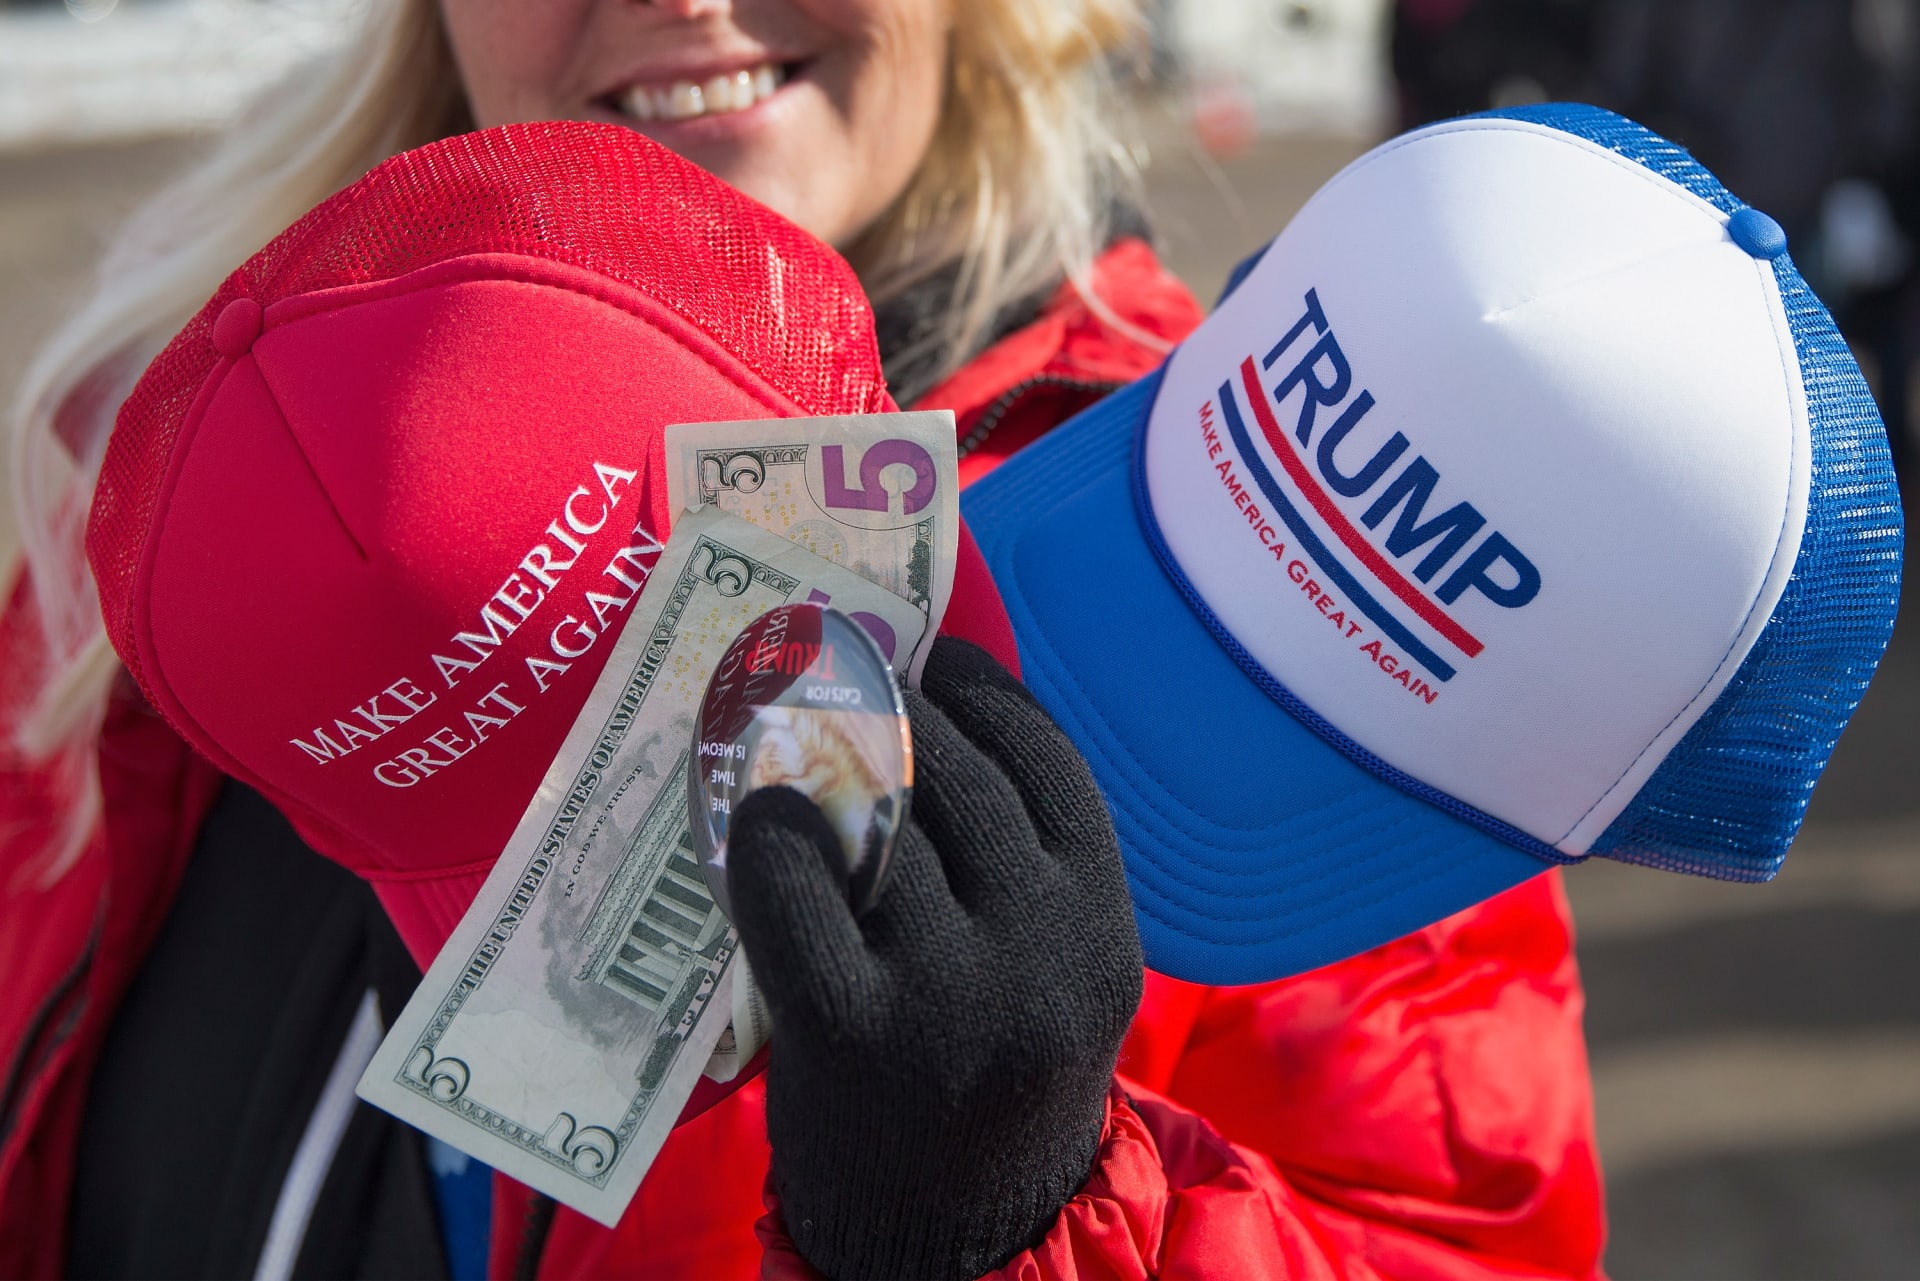 dc6235c5a Making Trucker Hats Great Again: Inside the Billion-Dollar Campaign ...